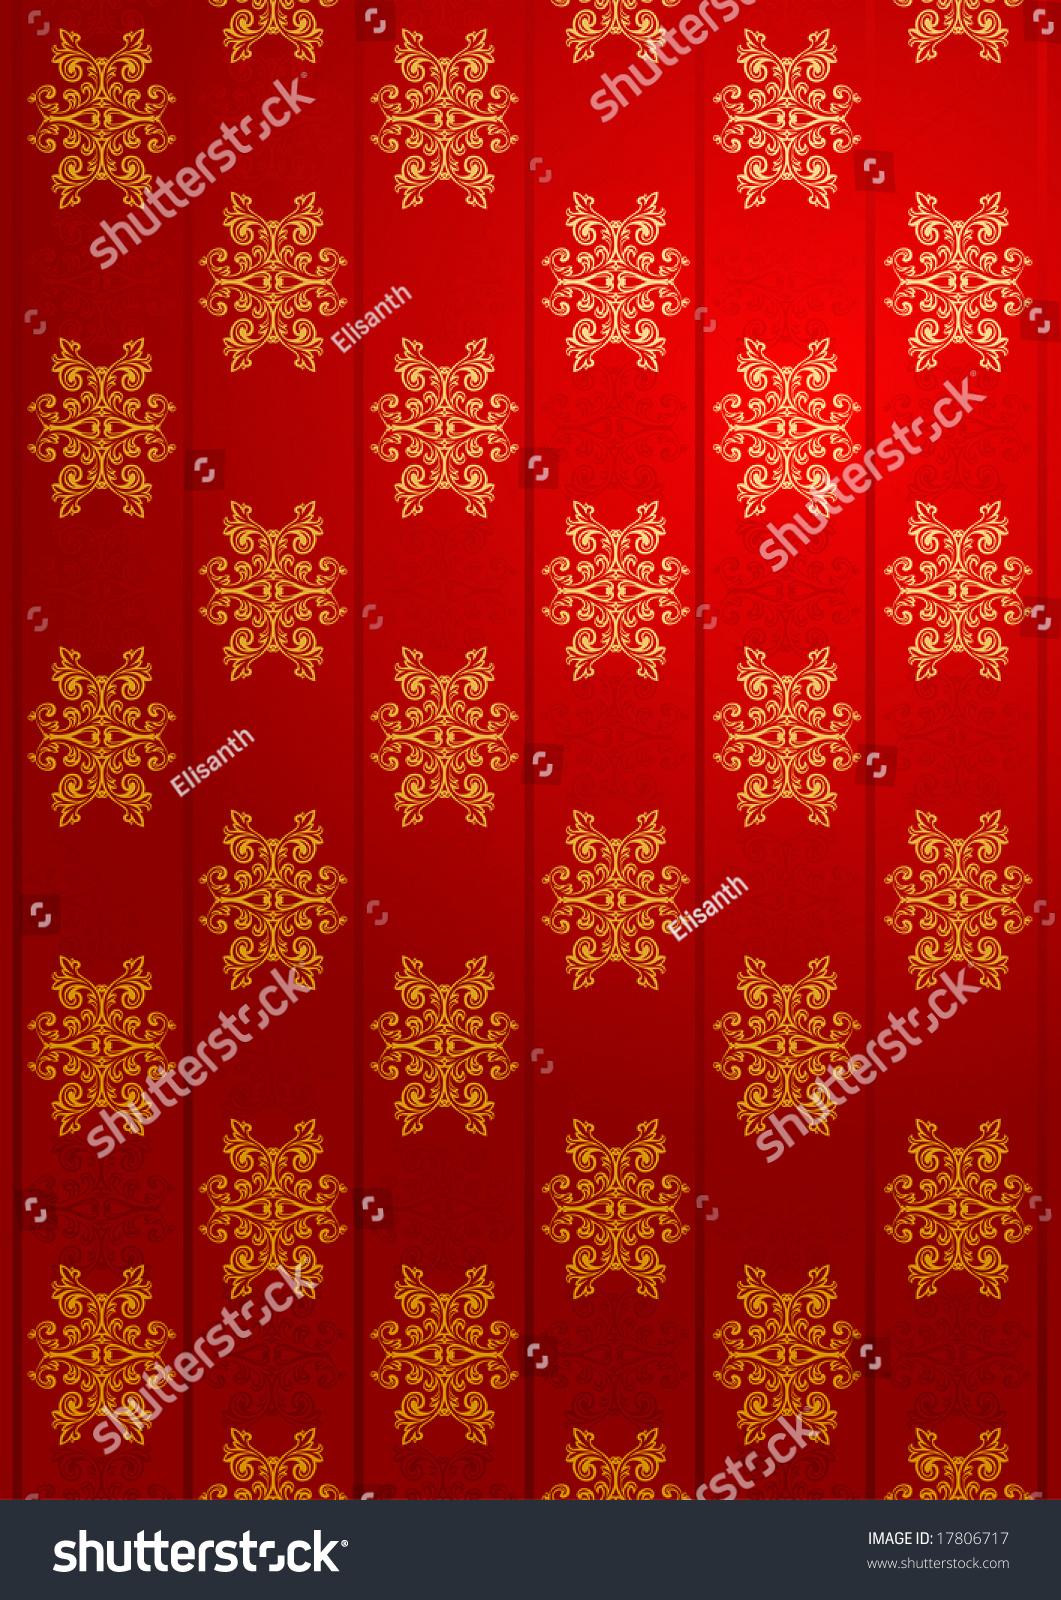 vector red gold glamour wallpaper stock vector 17806717 - shutterstock